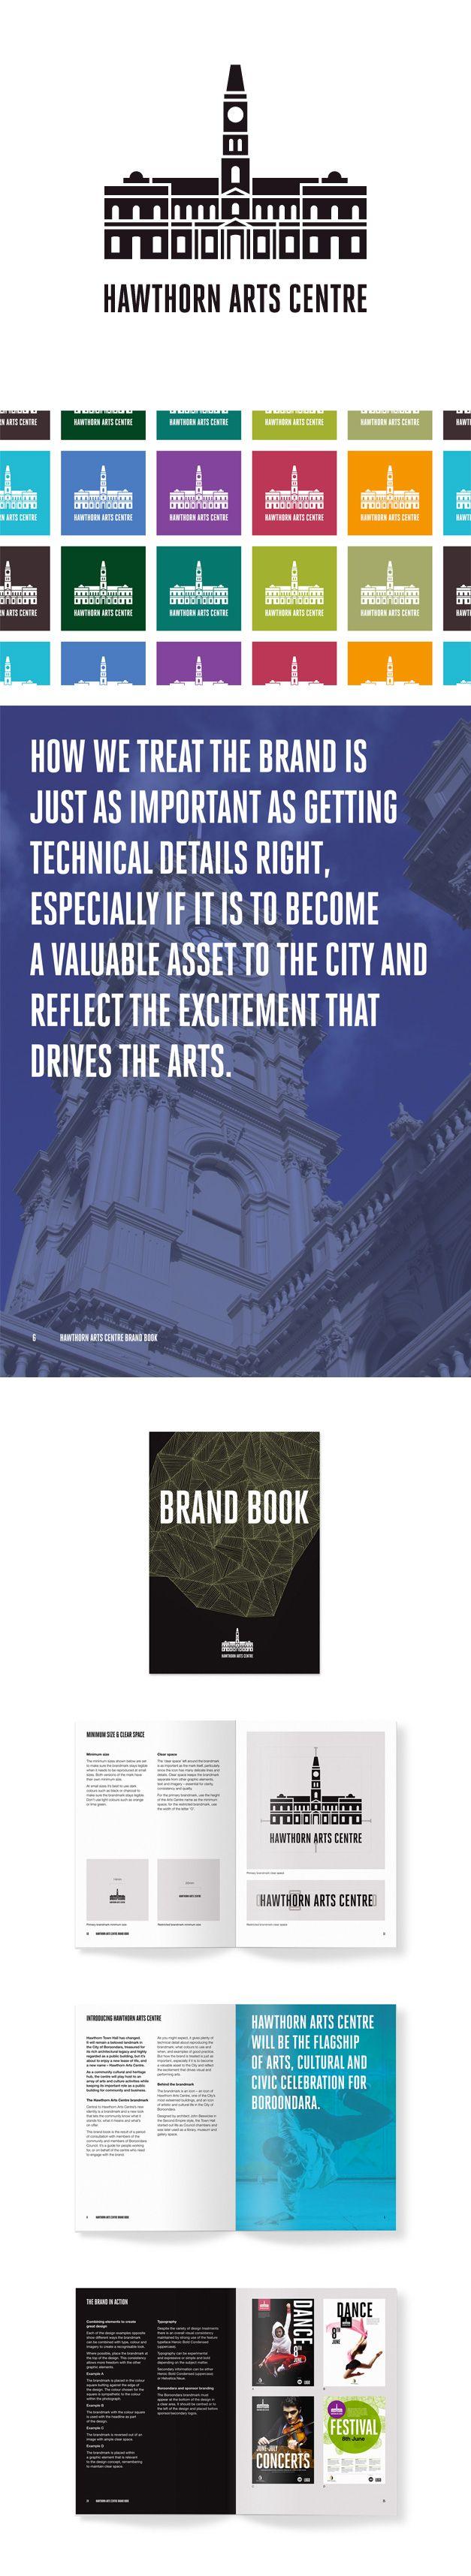 Hawthorn Arts Centre branding for City of Boroondara. www.fenton.com.au #communication #PR #branding #graphicdesign